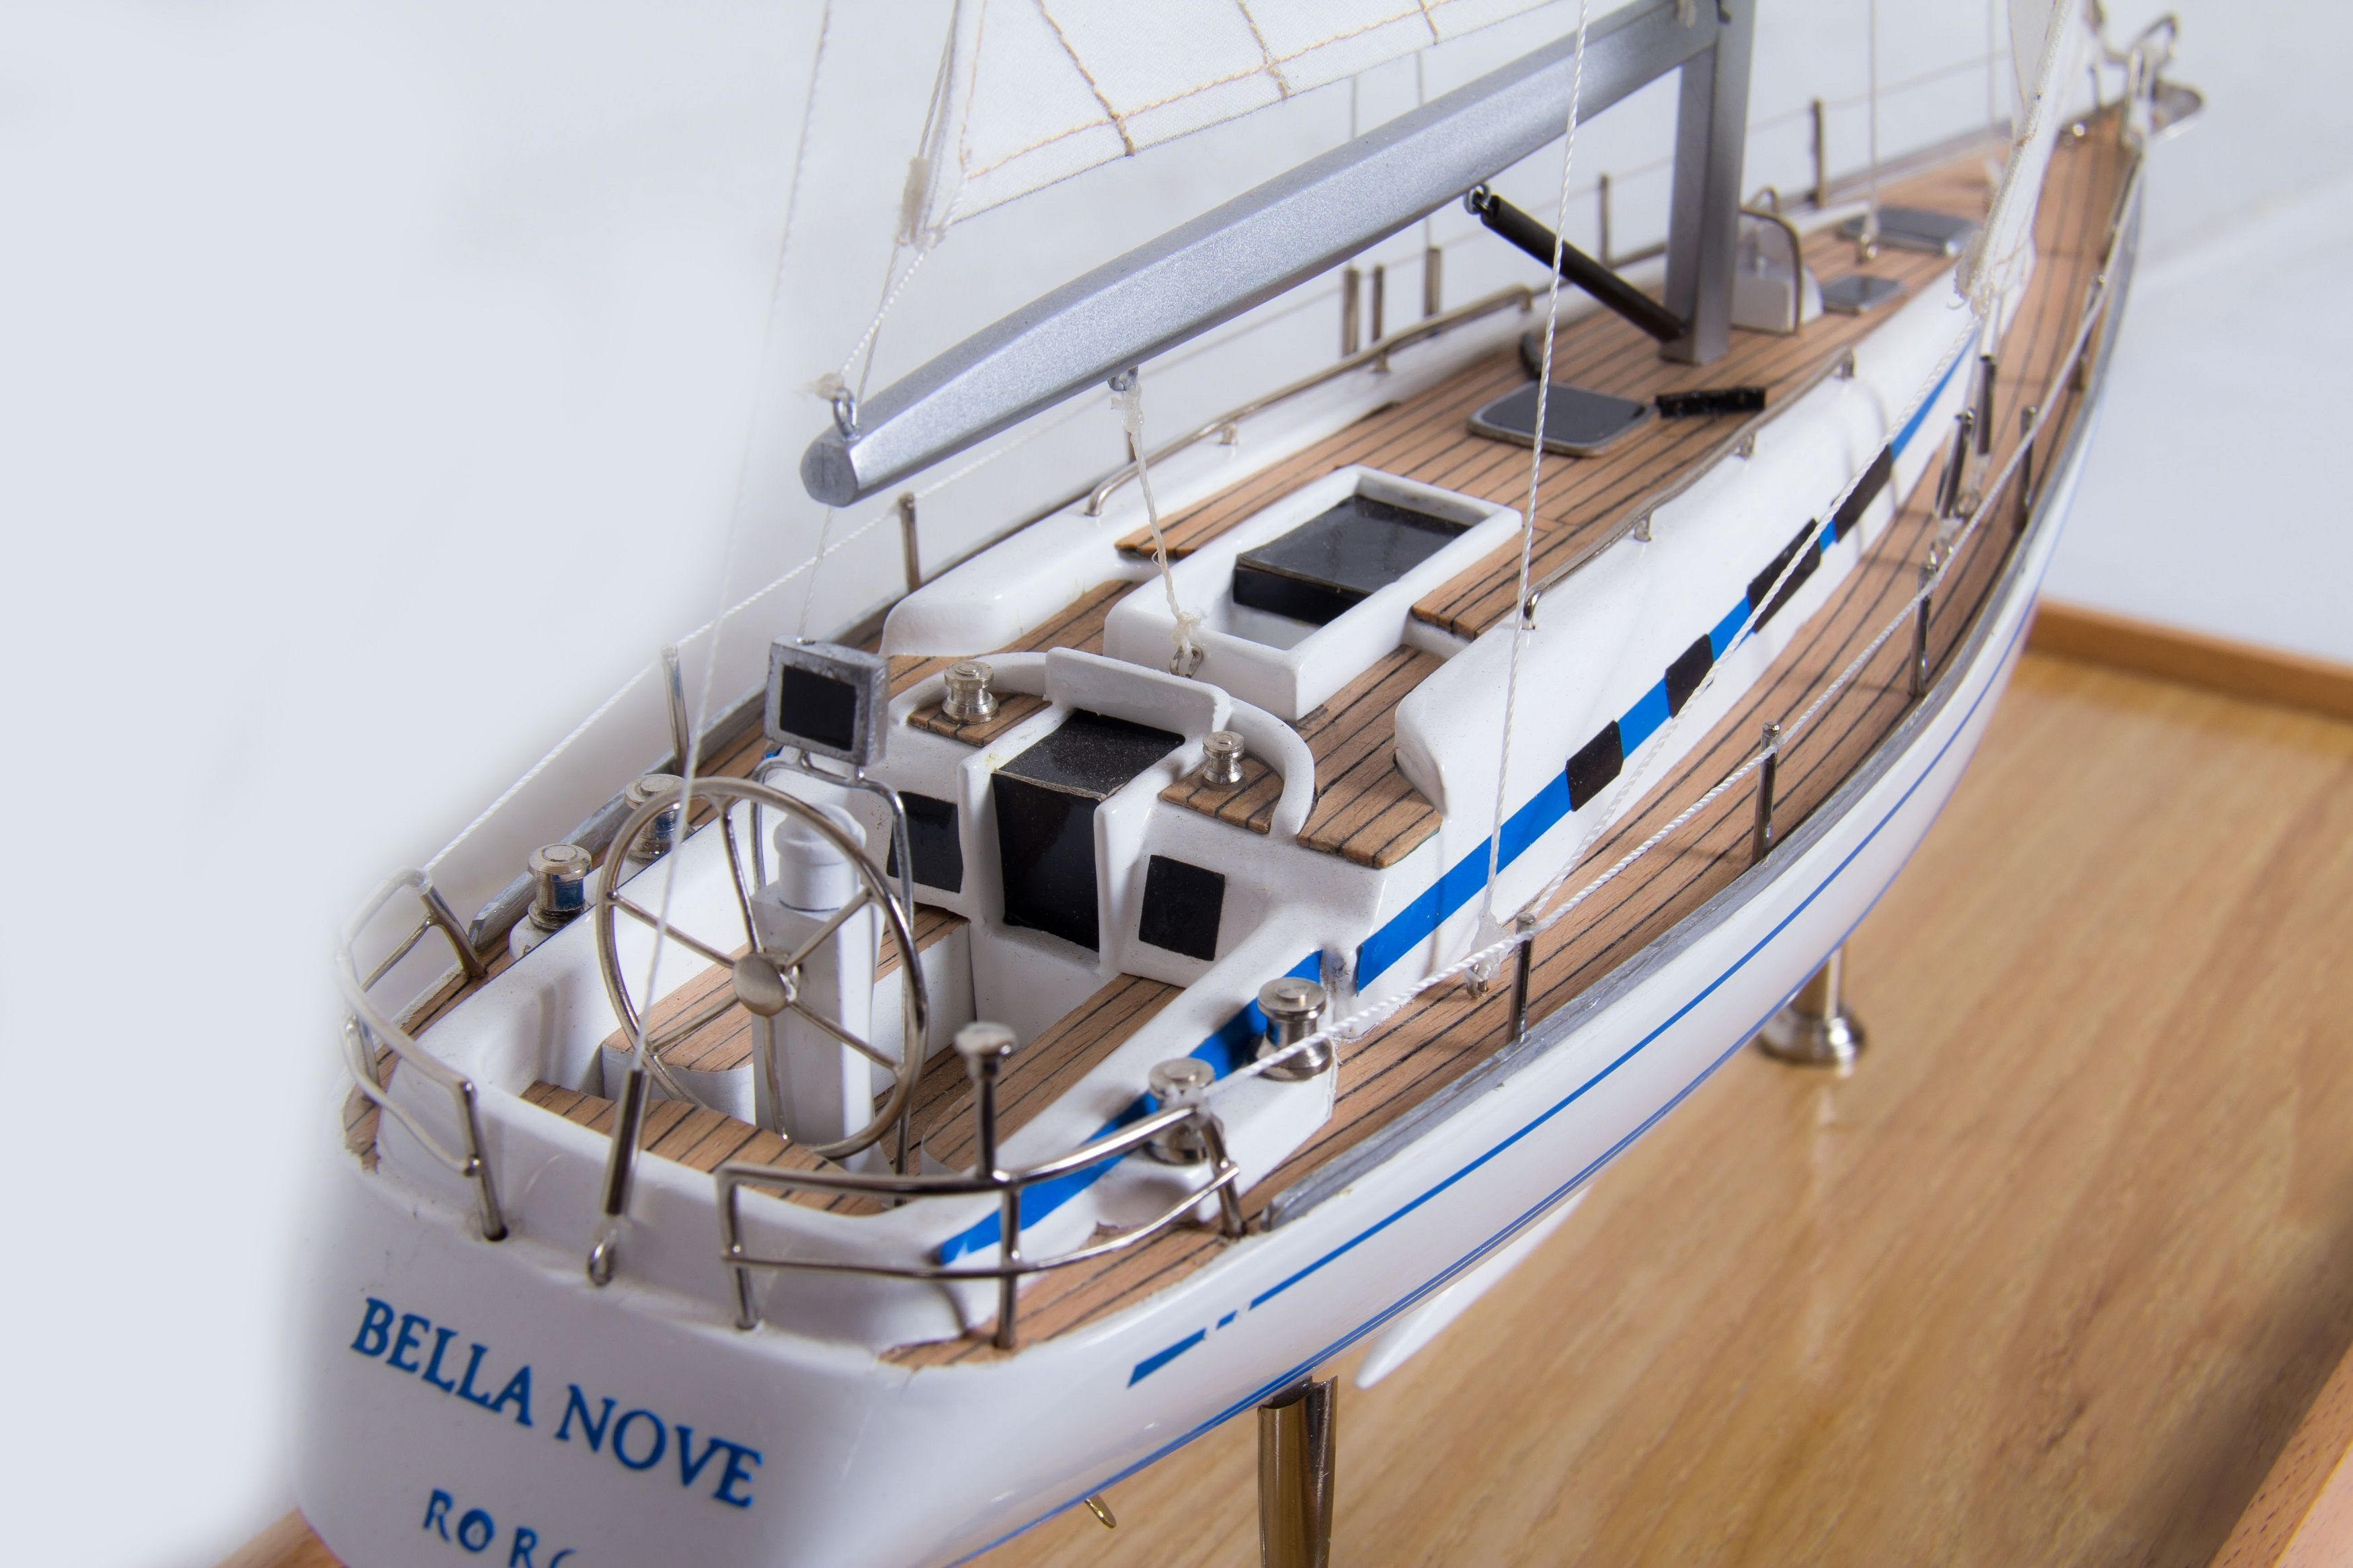 1775-9947-Bella-Nove-Sailing-Yacht-model